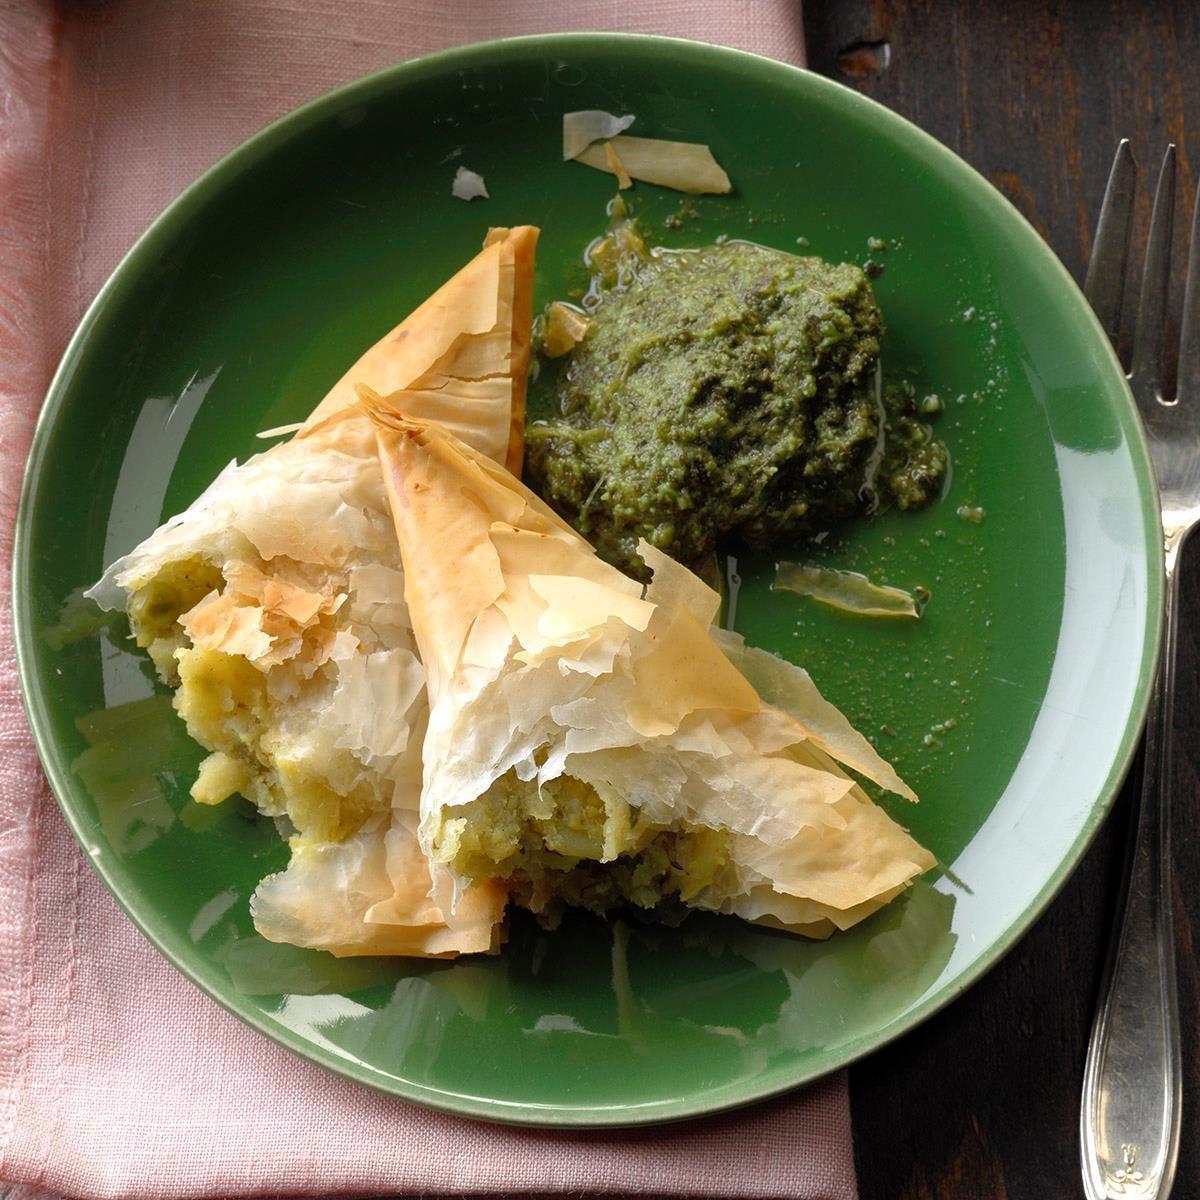 Wednesday: Vegetable Samosas